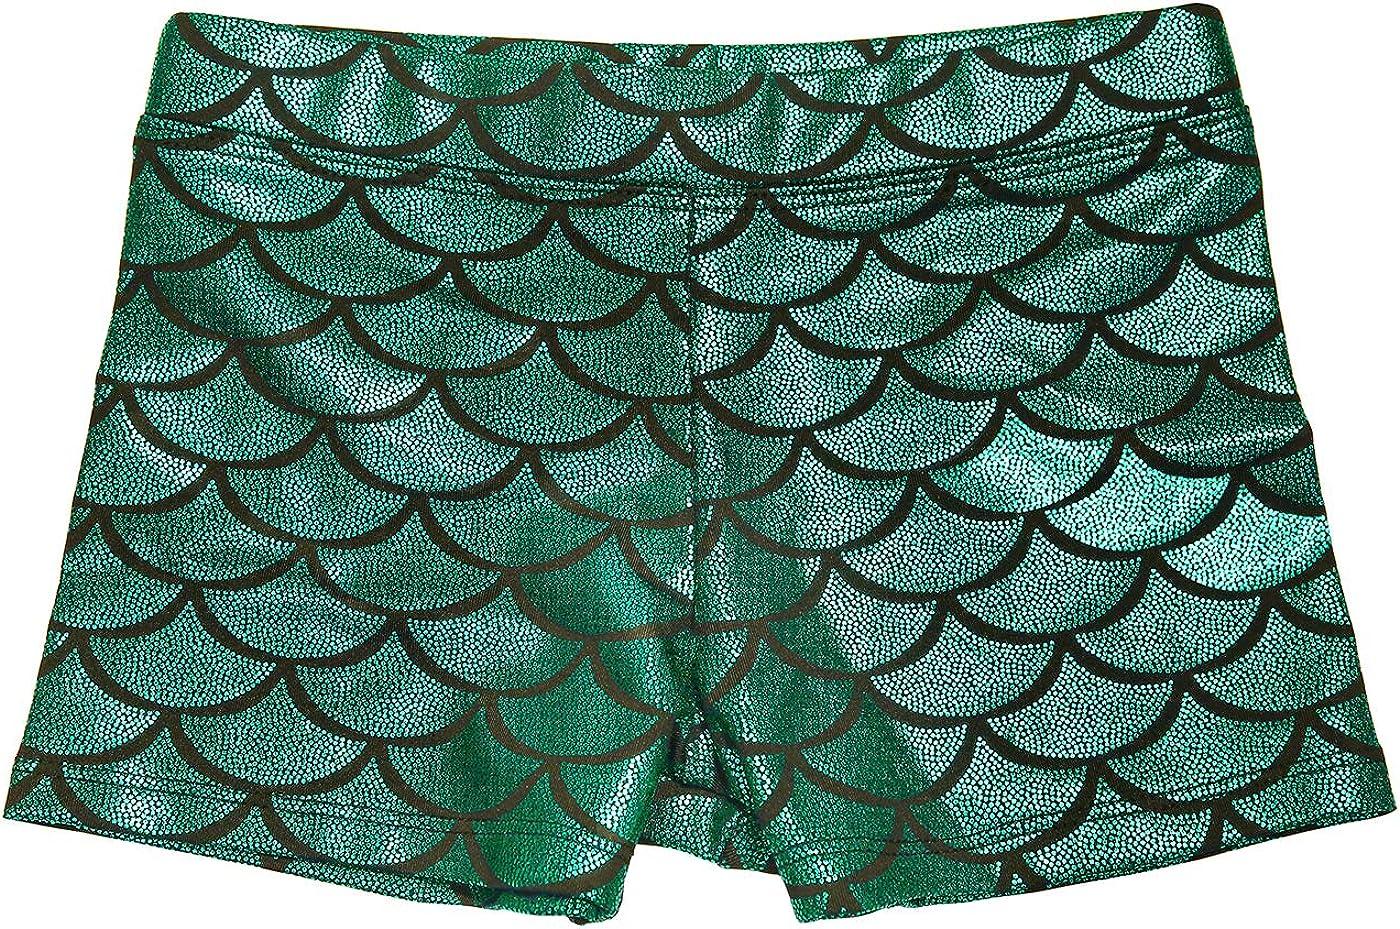 HDE Gymnastics Shorts for Girls - Mermaid Dance Shorts Fish Scale Shorts: Clothing